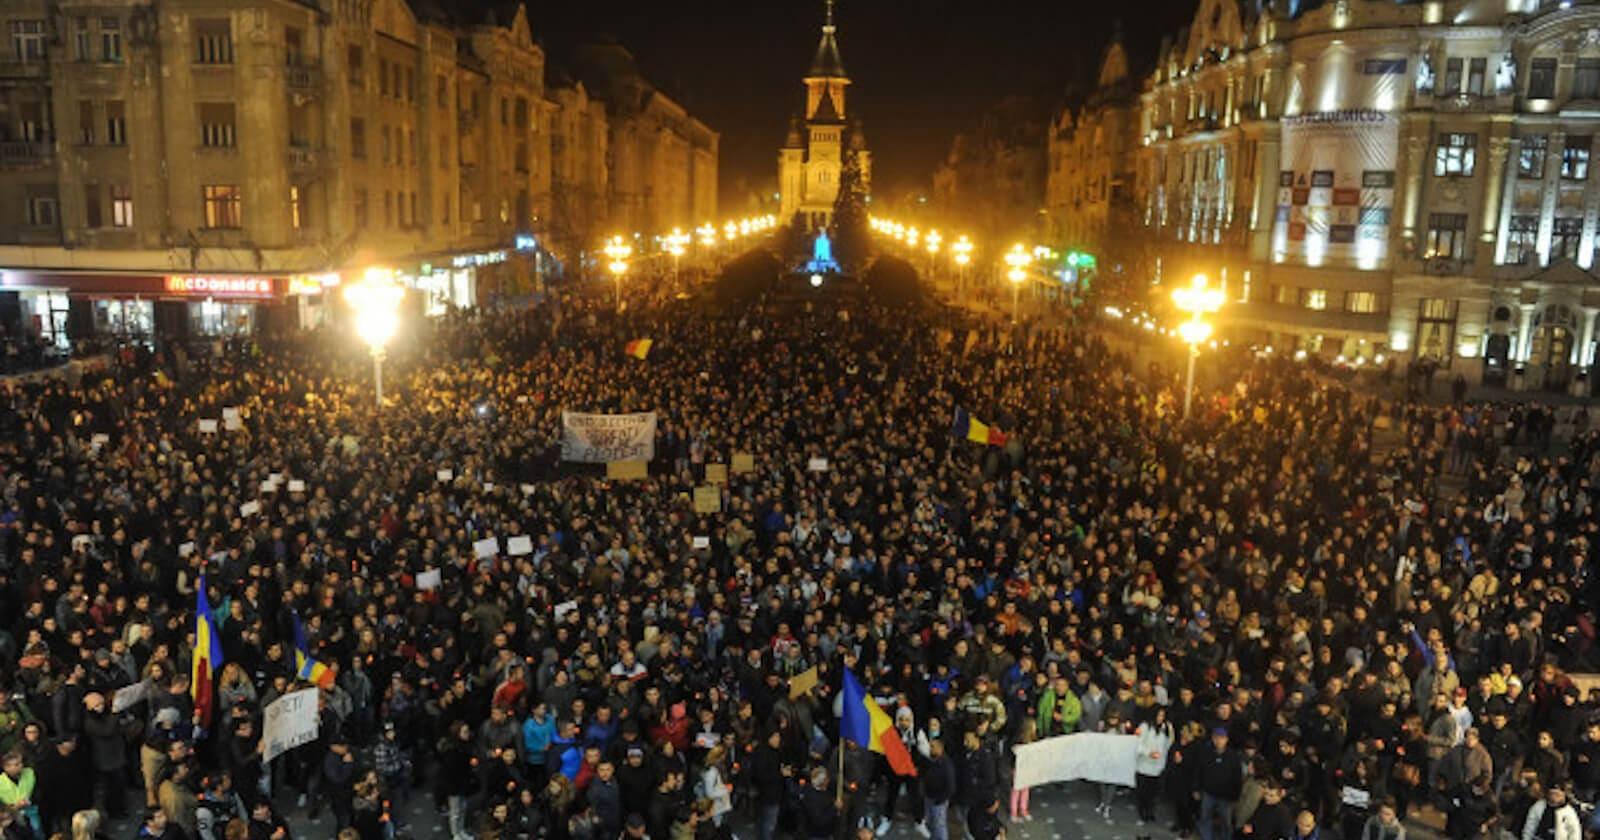 https://ziarul.romania-rationala.ro/control/articole/articole/popor-suveran-popor-liber.jpg